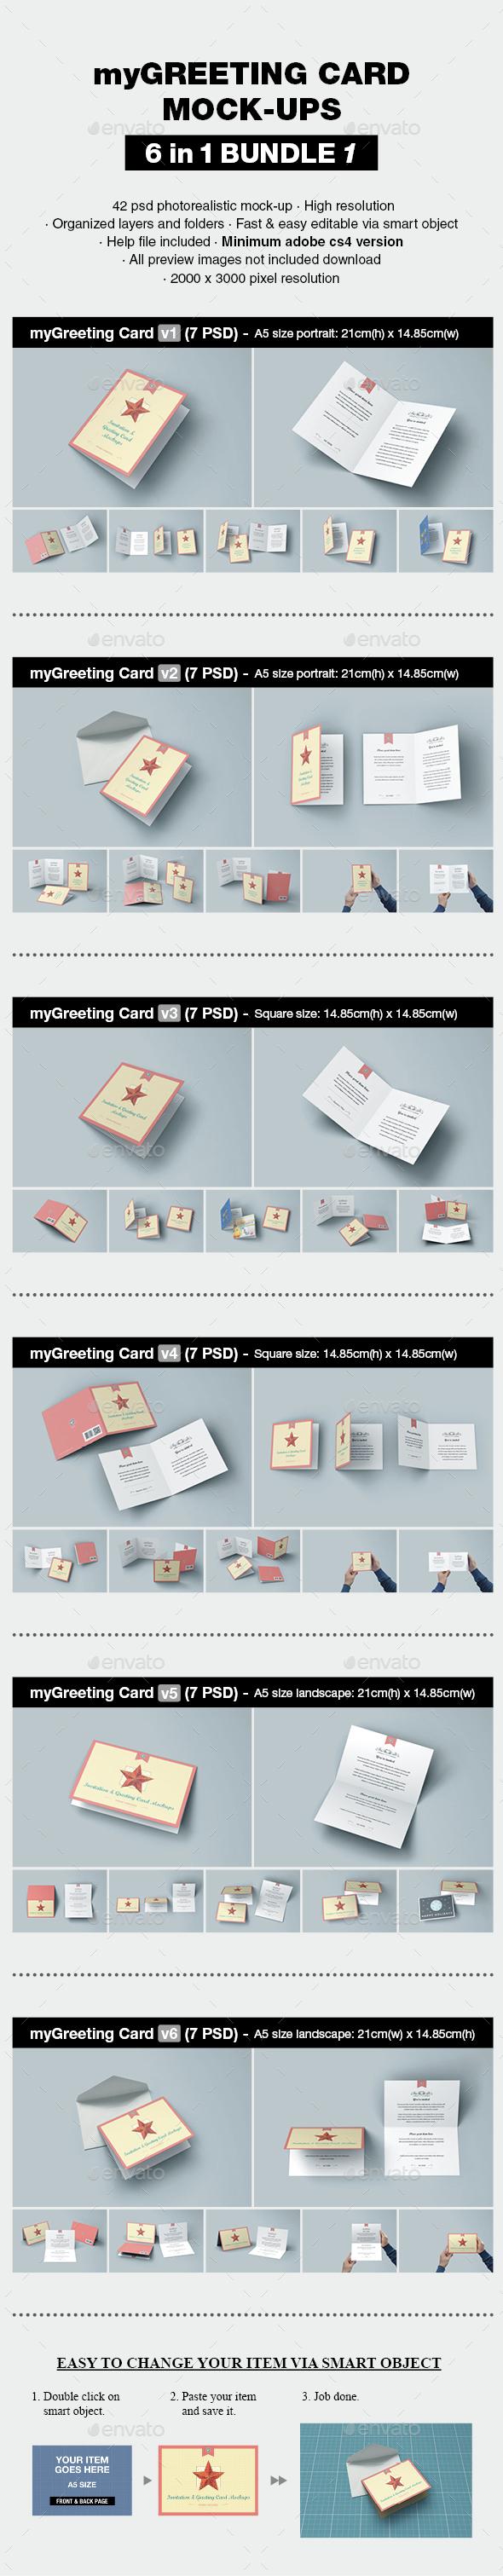 myGreeting Card Mock-up Bundle 1 - Print Product Mock-Ups